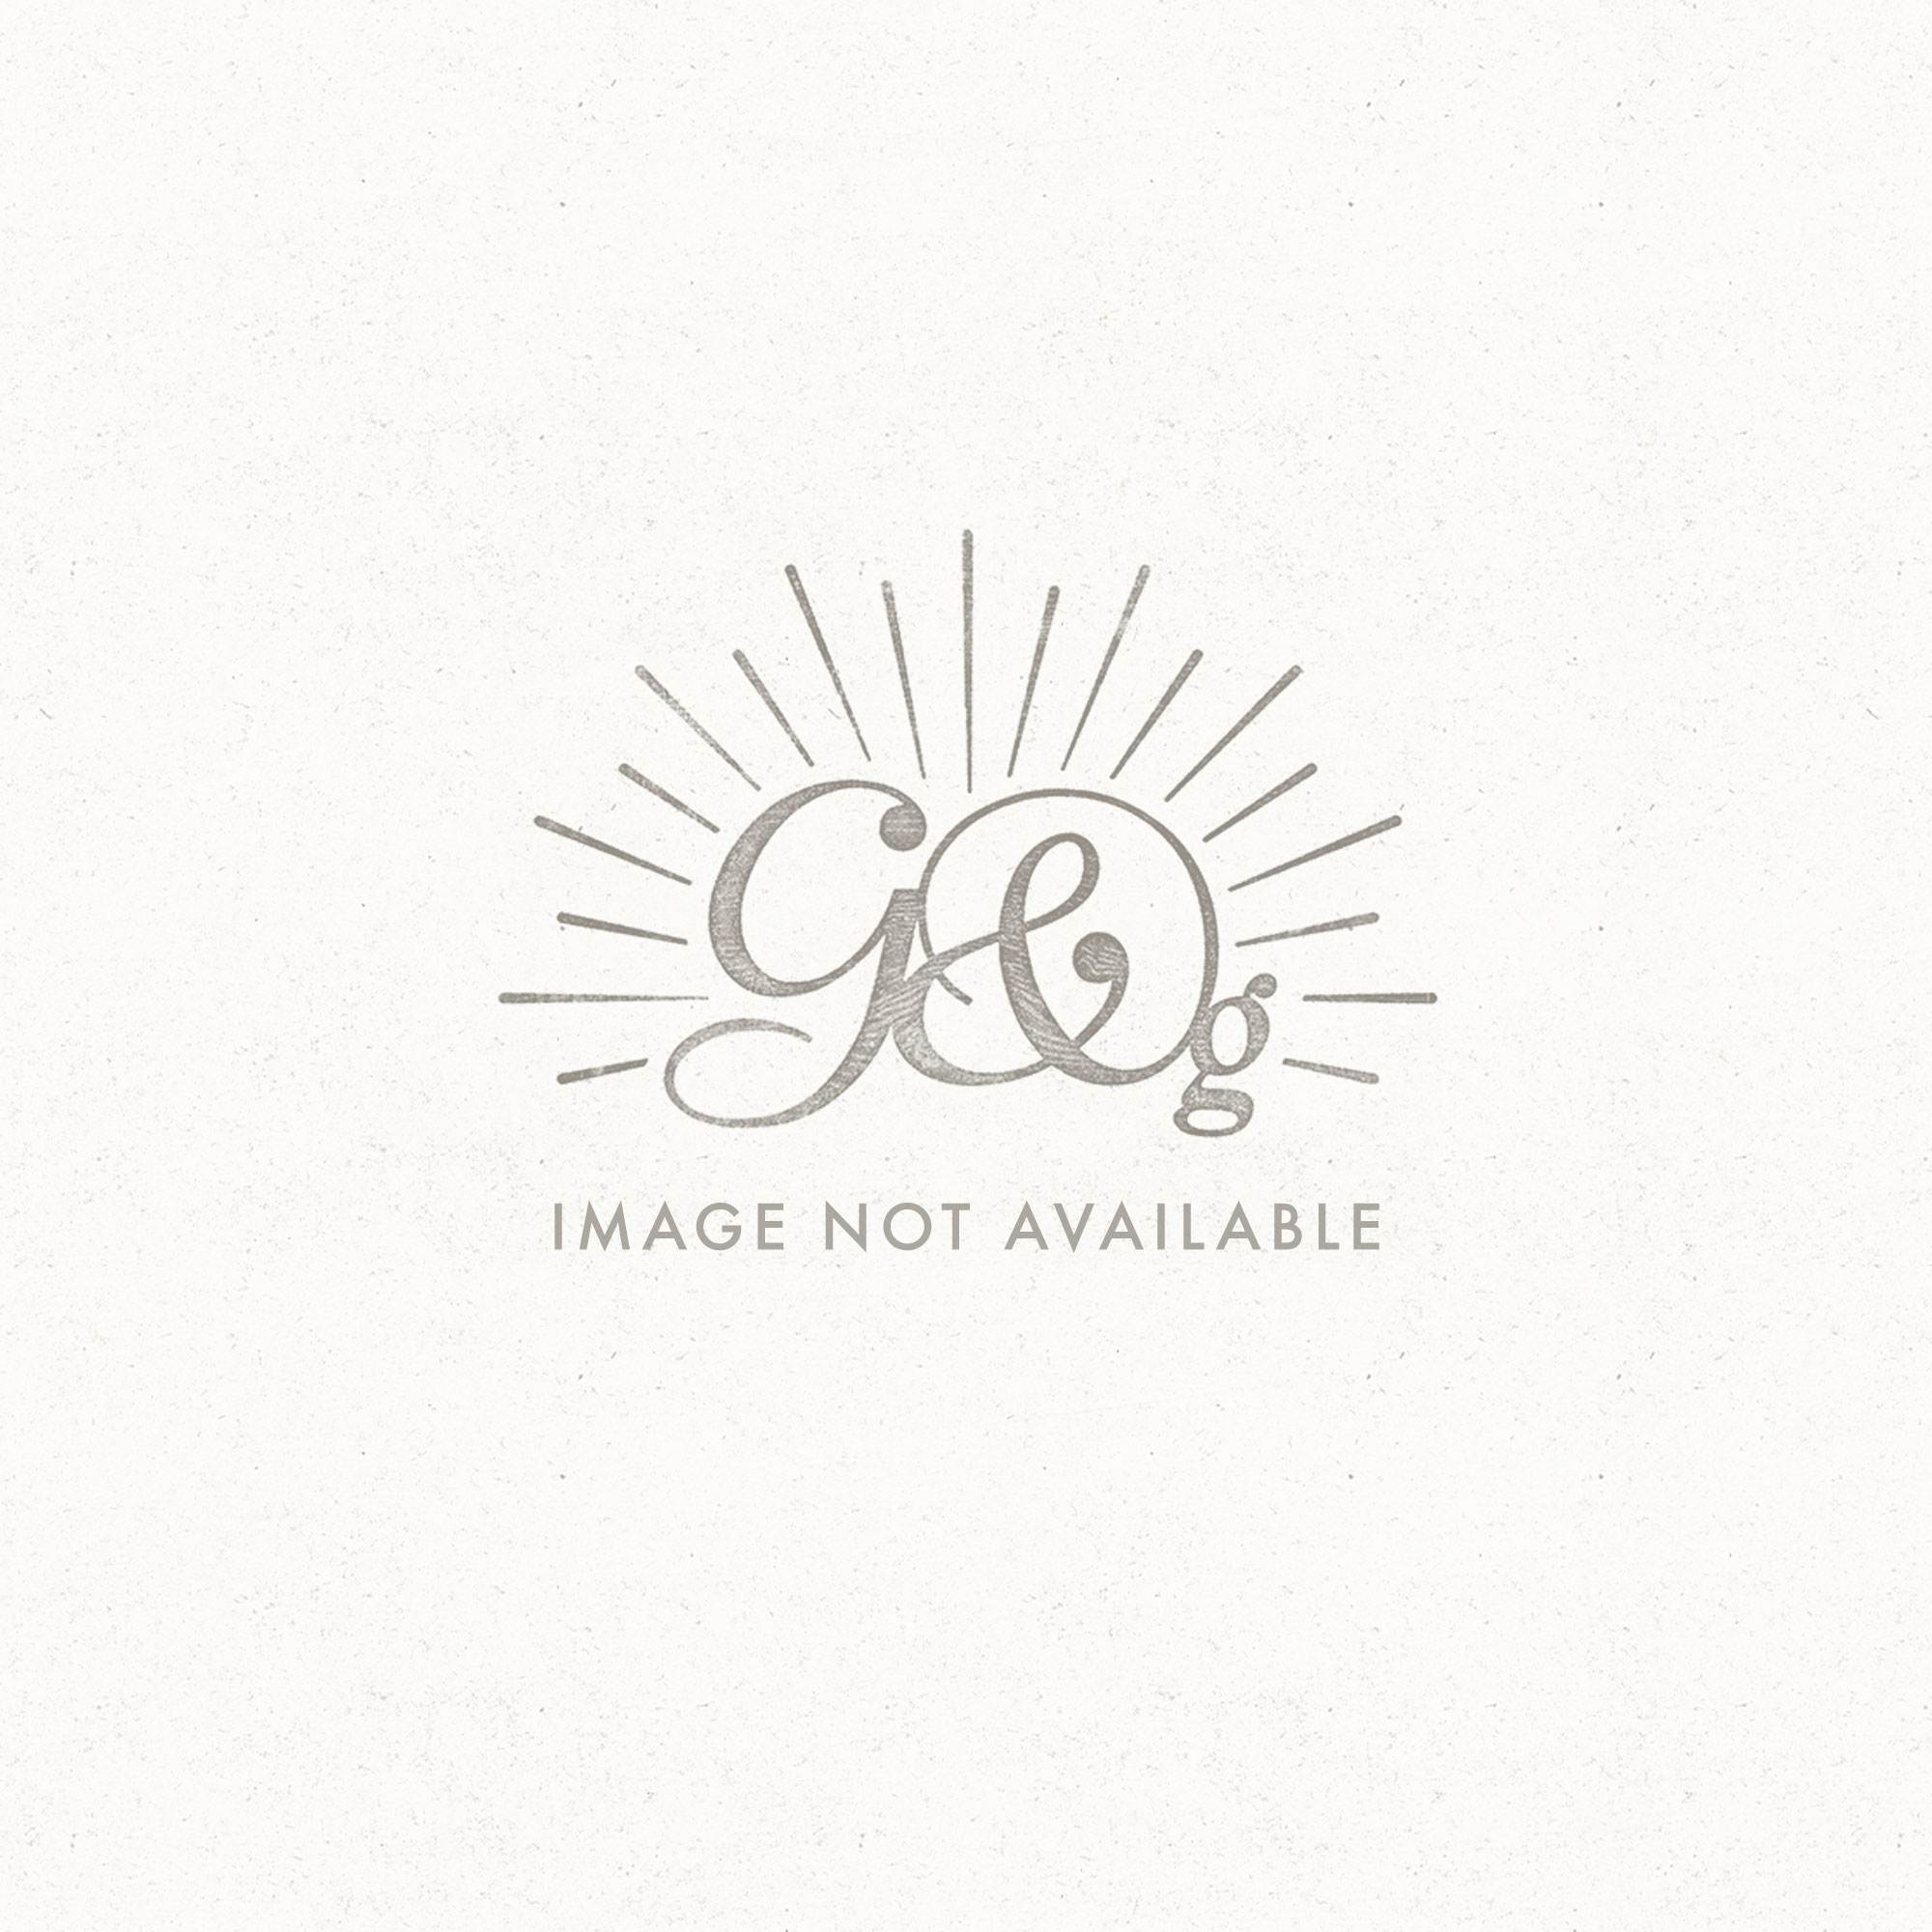 Infinity Loop - Thumbnail